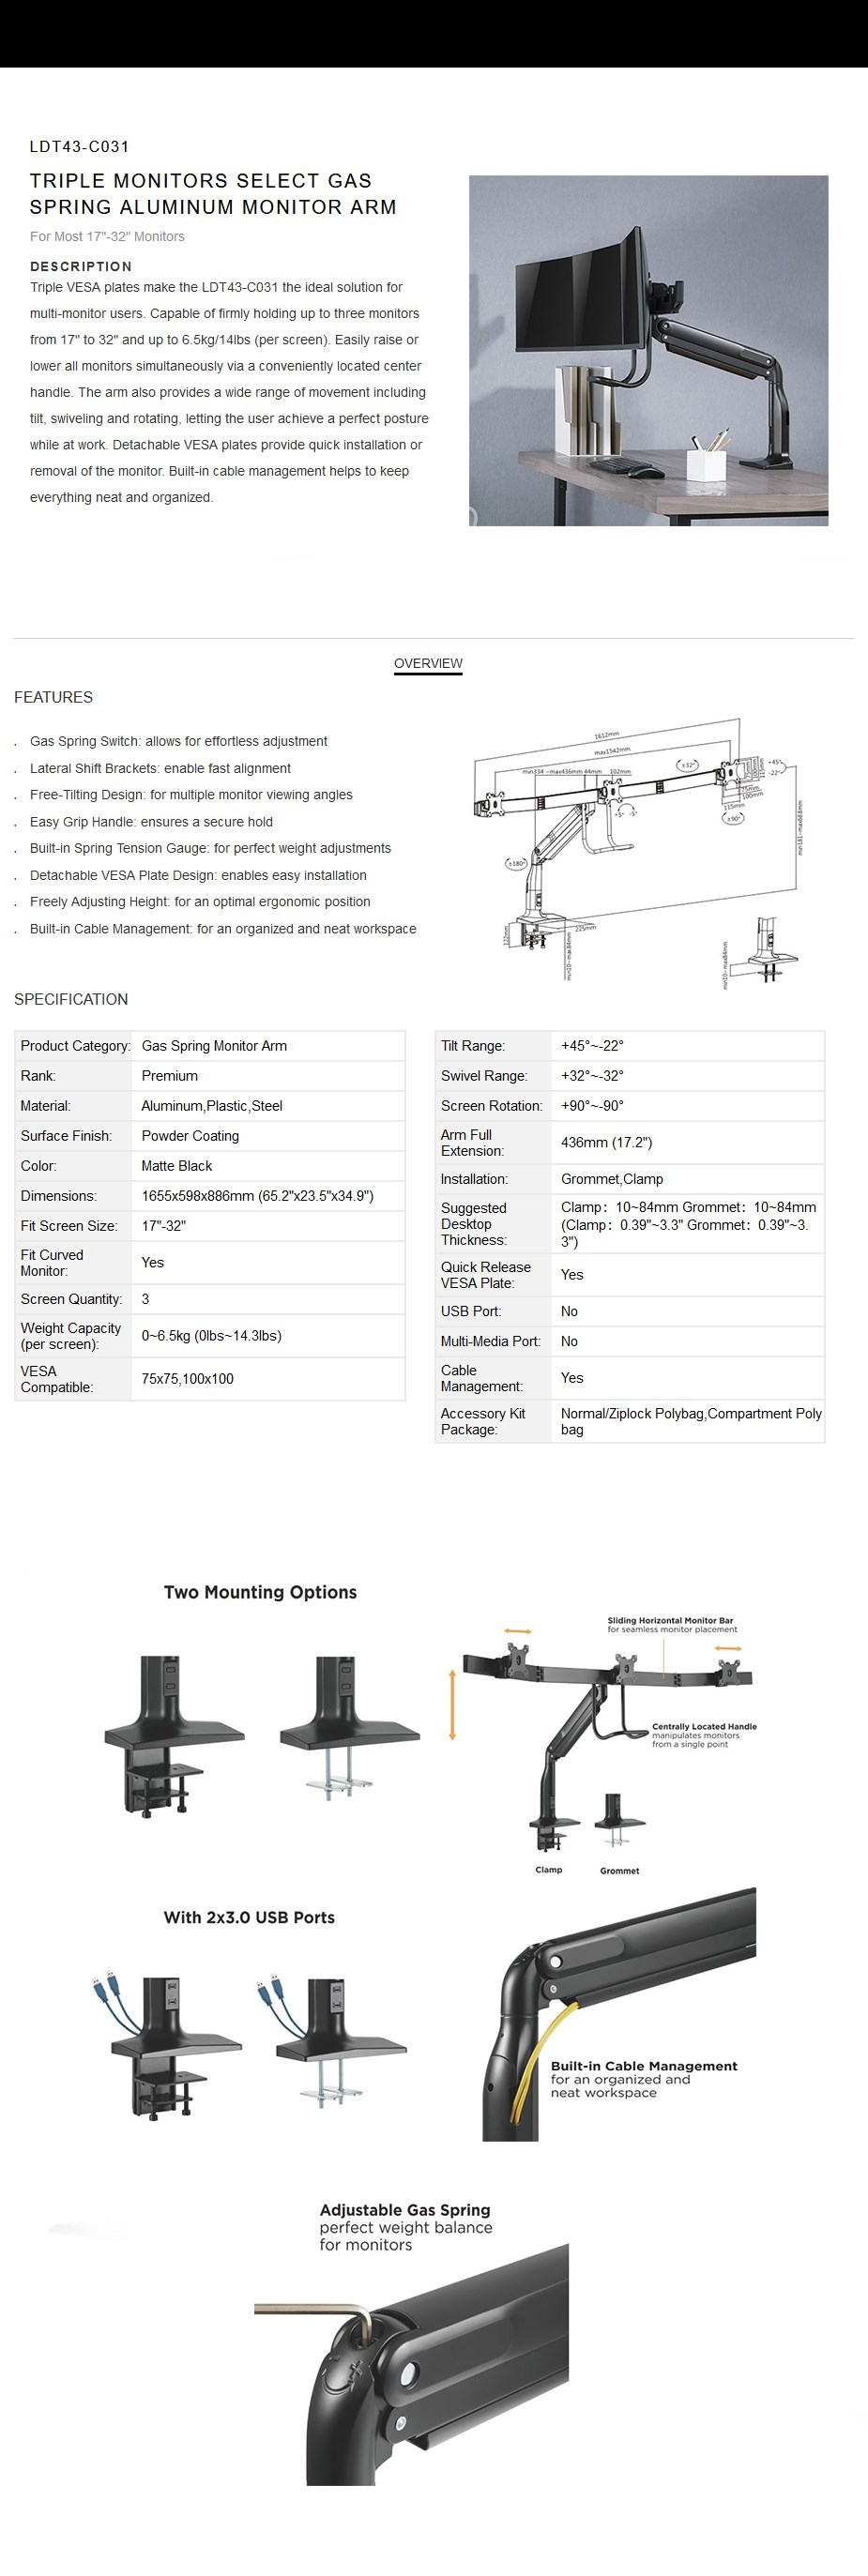 brateck-ldt43c031-triple-monitorafs-select-gas-spring-aluminum-monitor-arm-ac39158-2.jpg